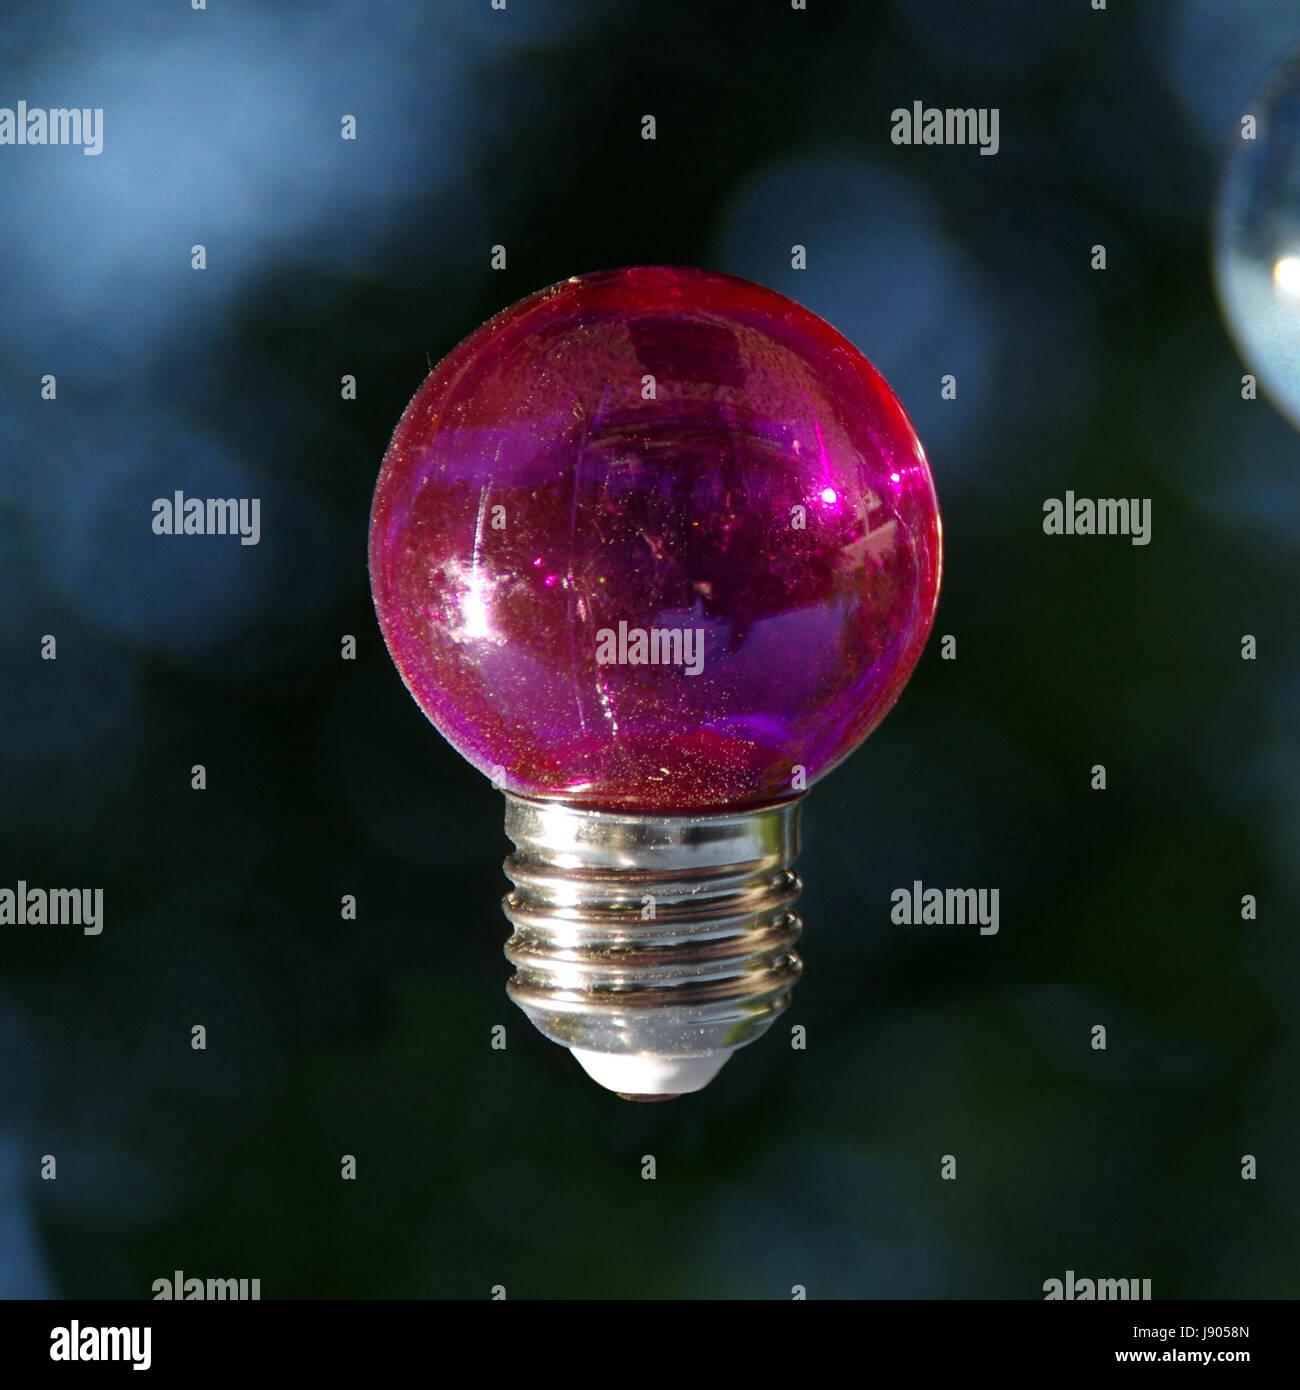 Red vitreous bulb on dark background - Stock Image